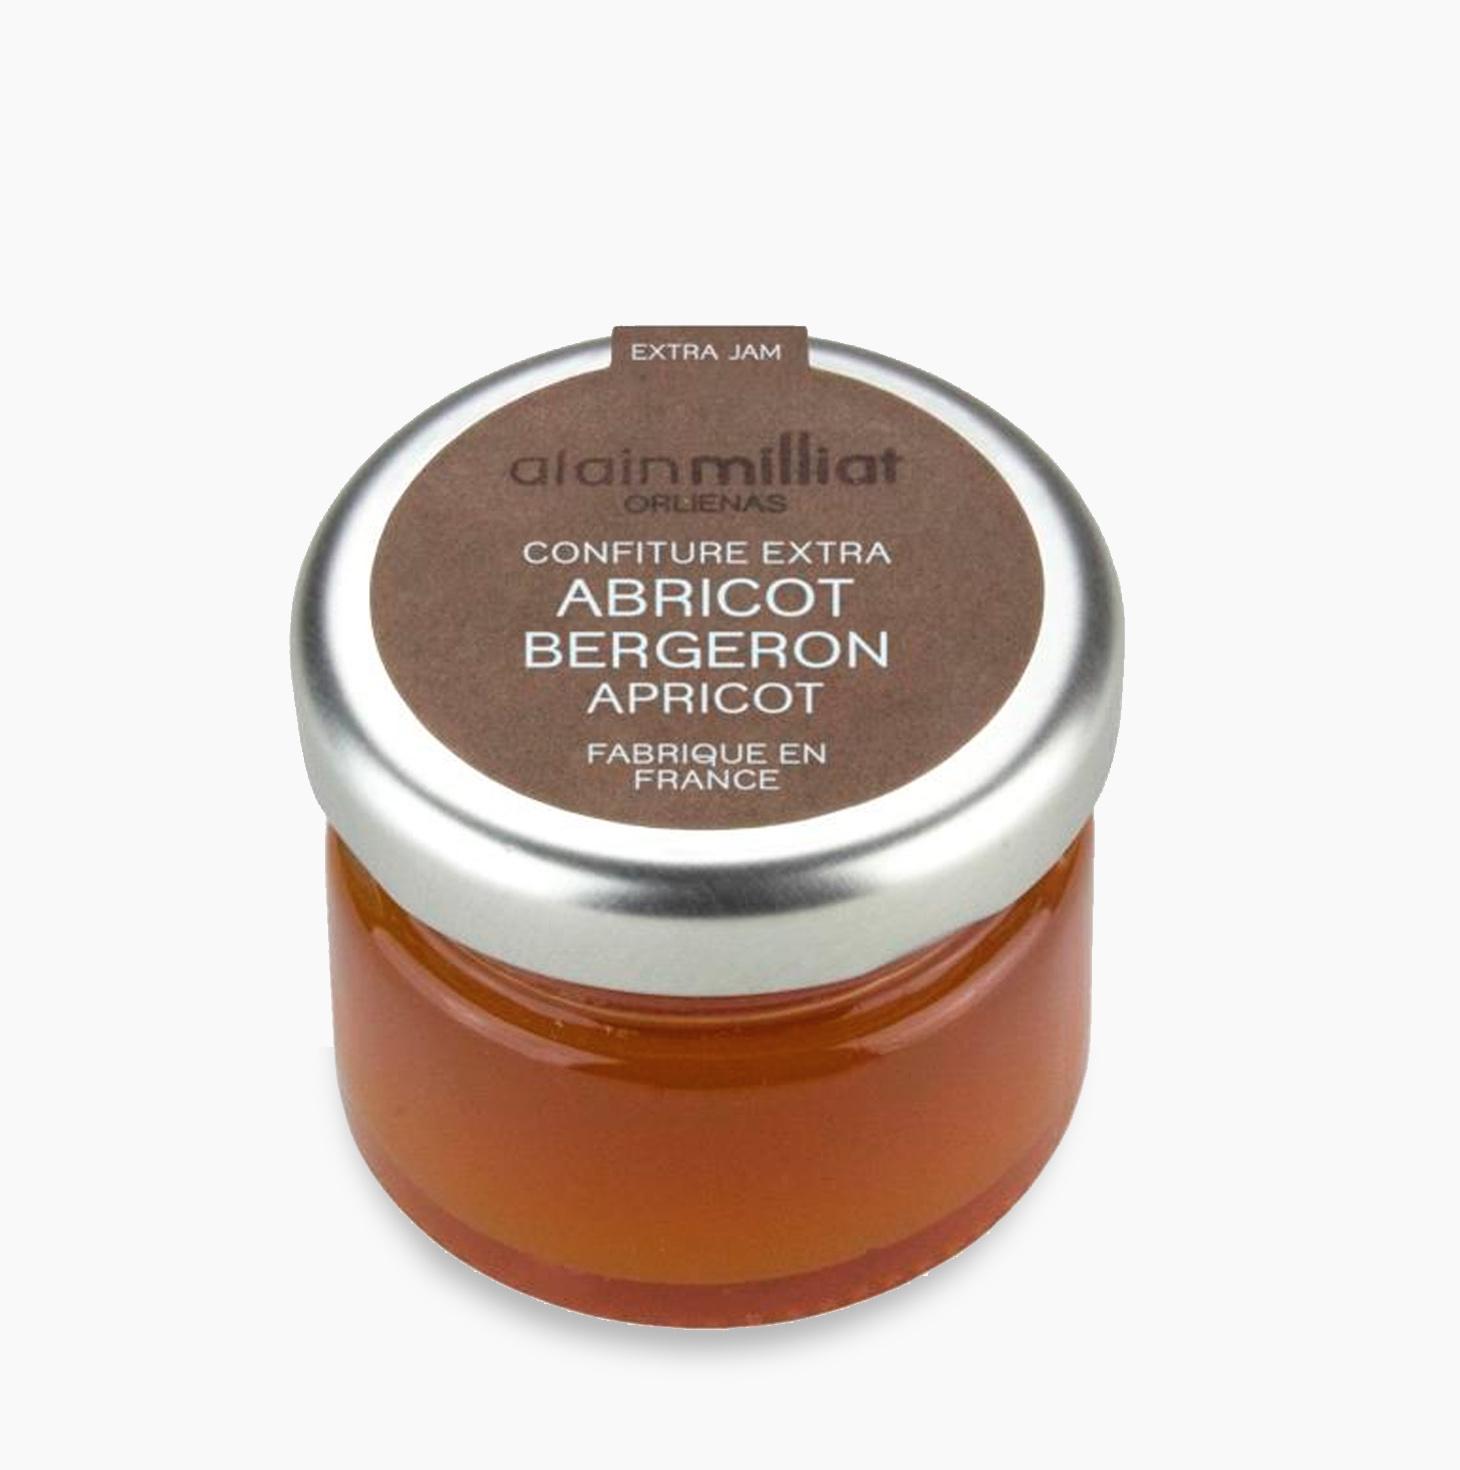 Confiture Extra Abricot Bergeron, Alain Milliat (30 g)